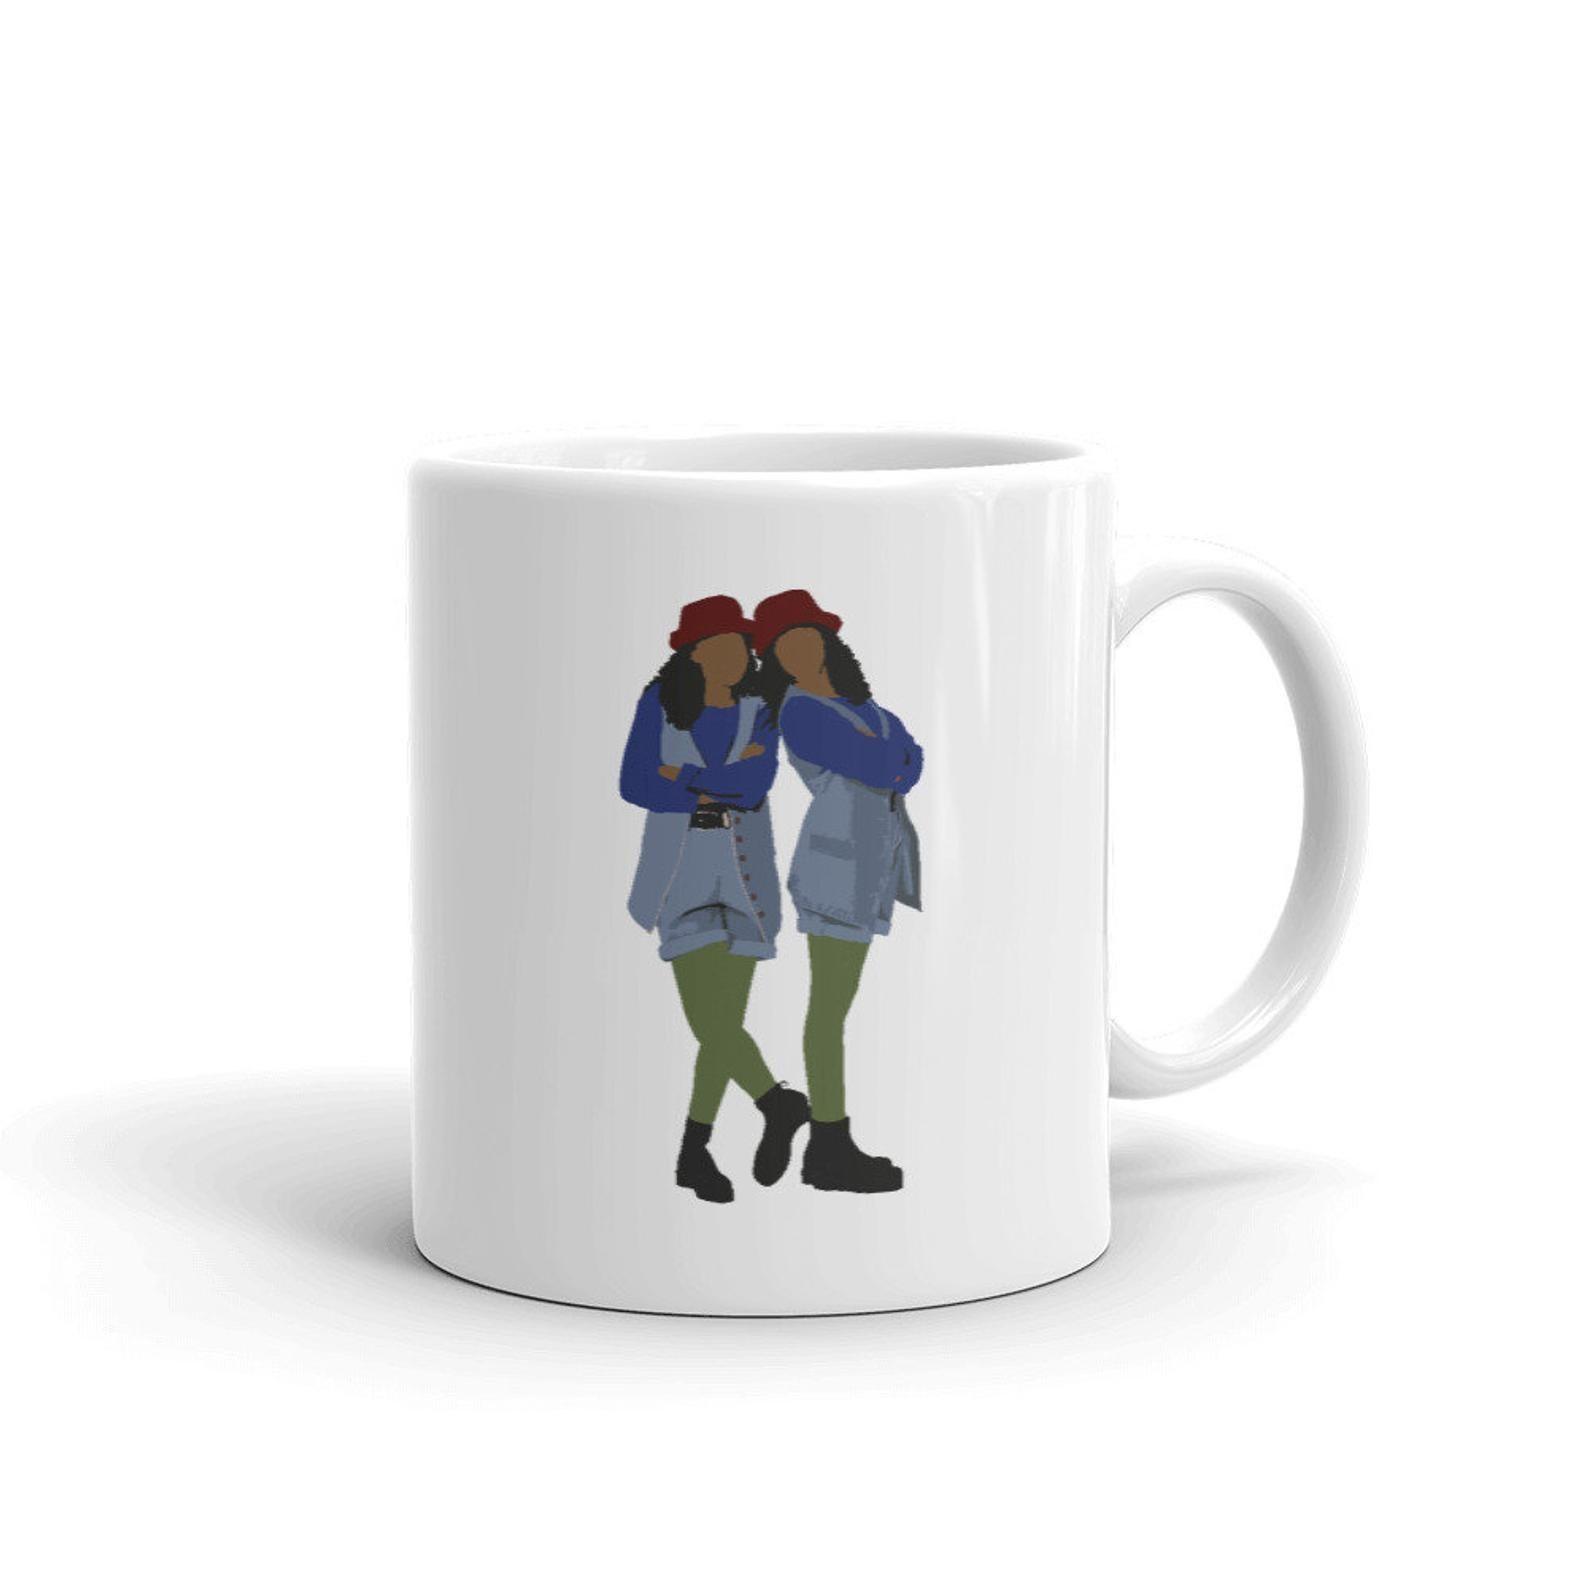 mug with the animated silhouettes of Tia & Tamara